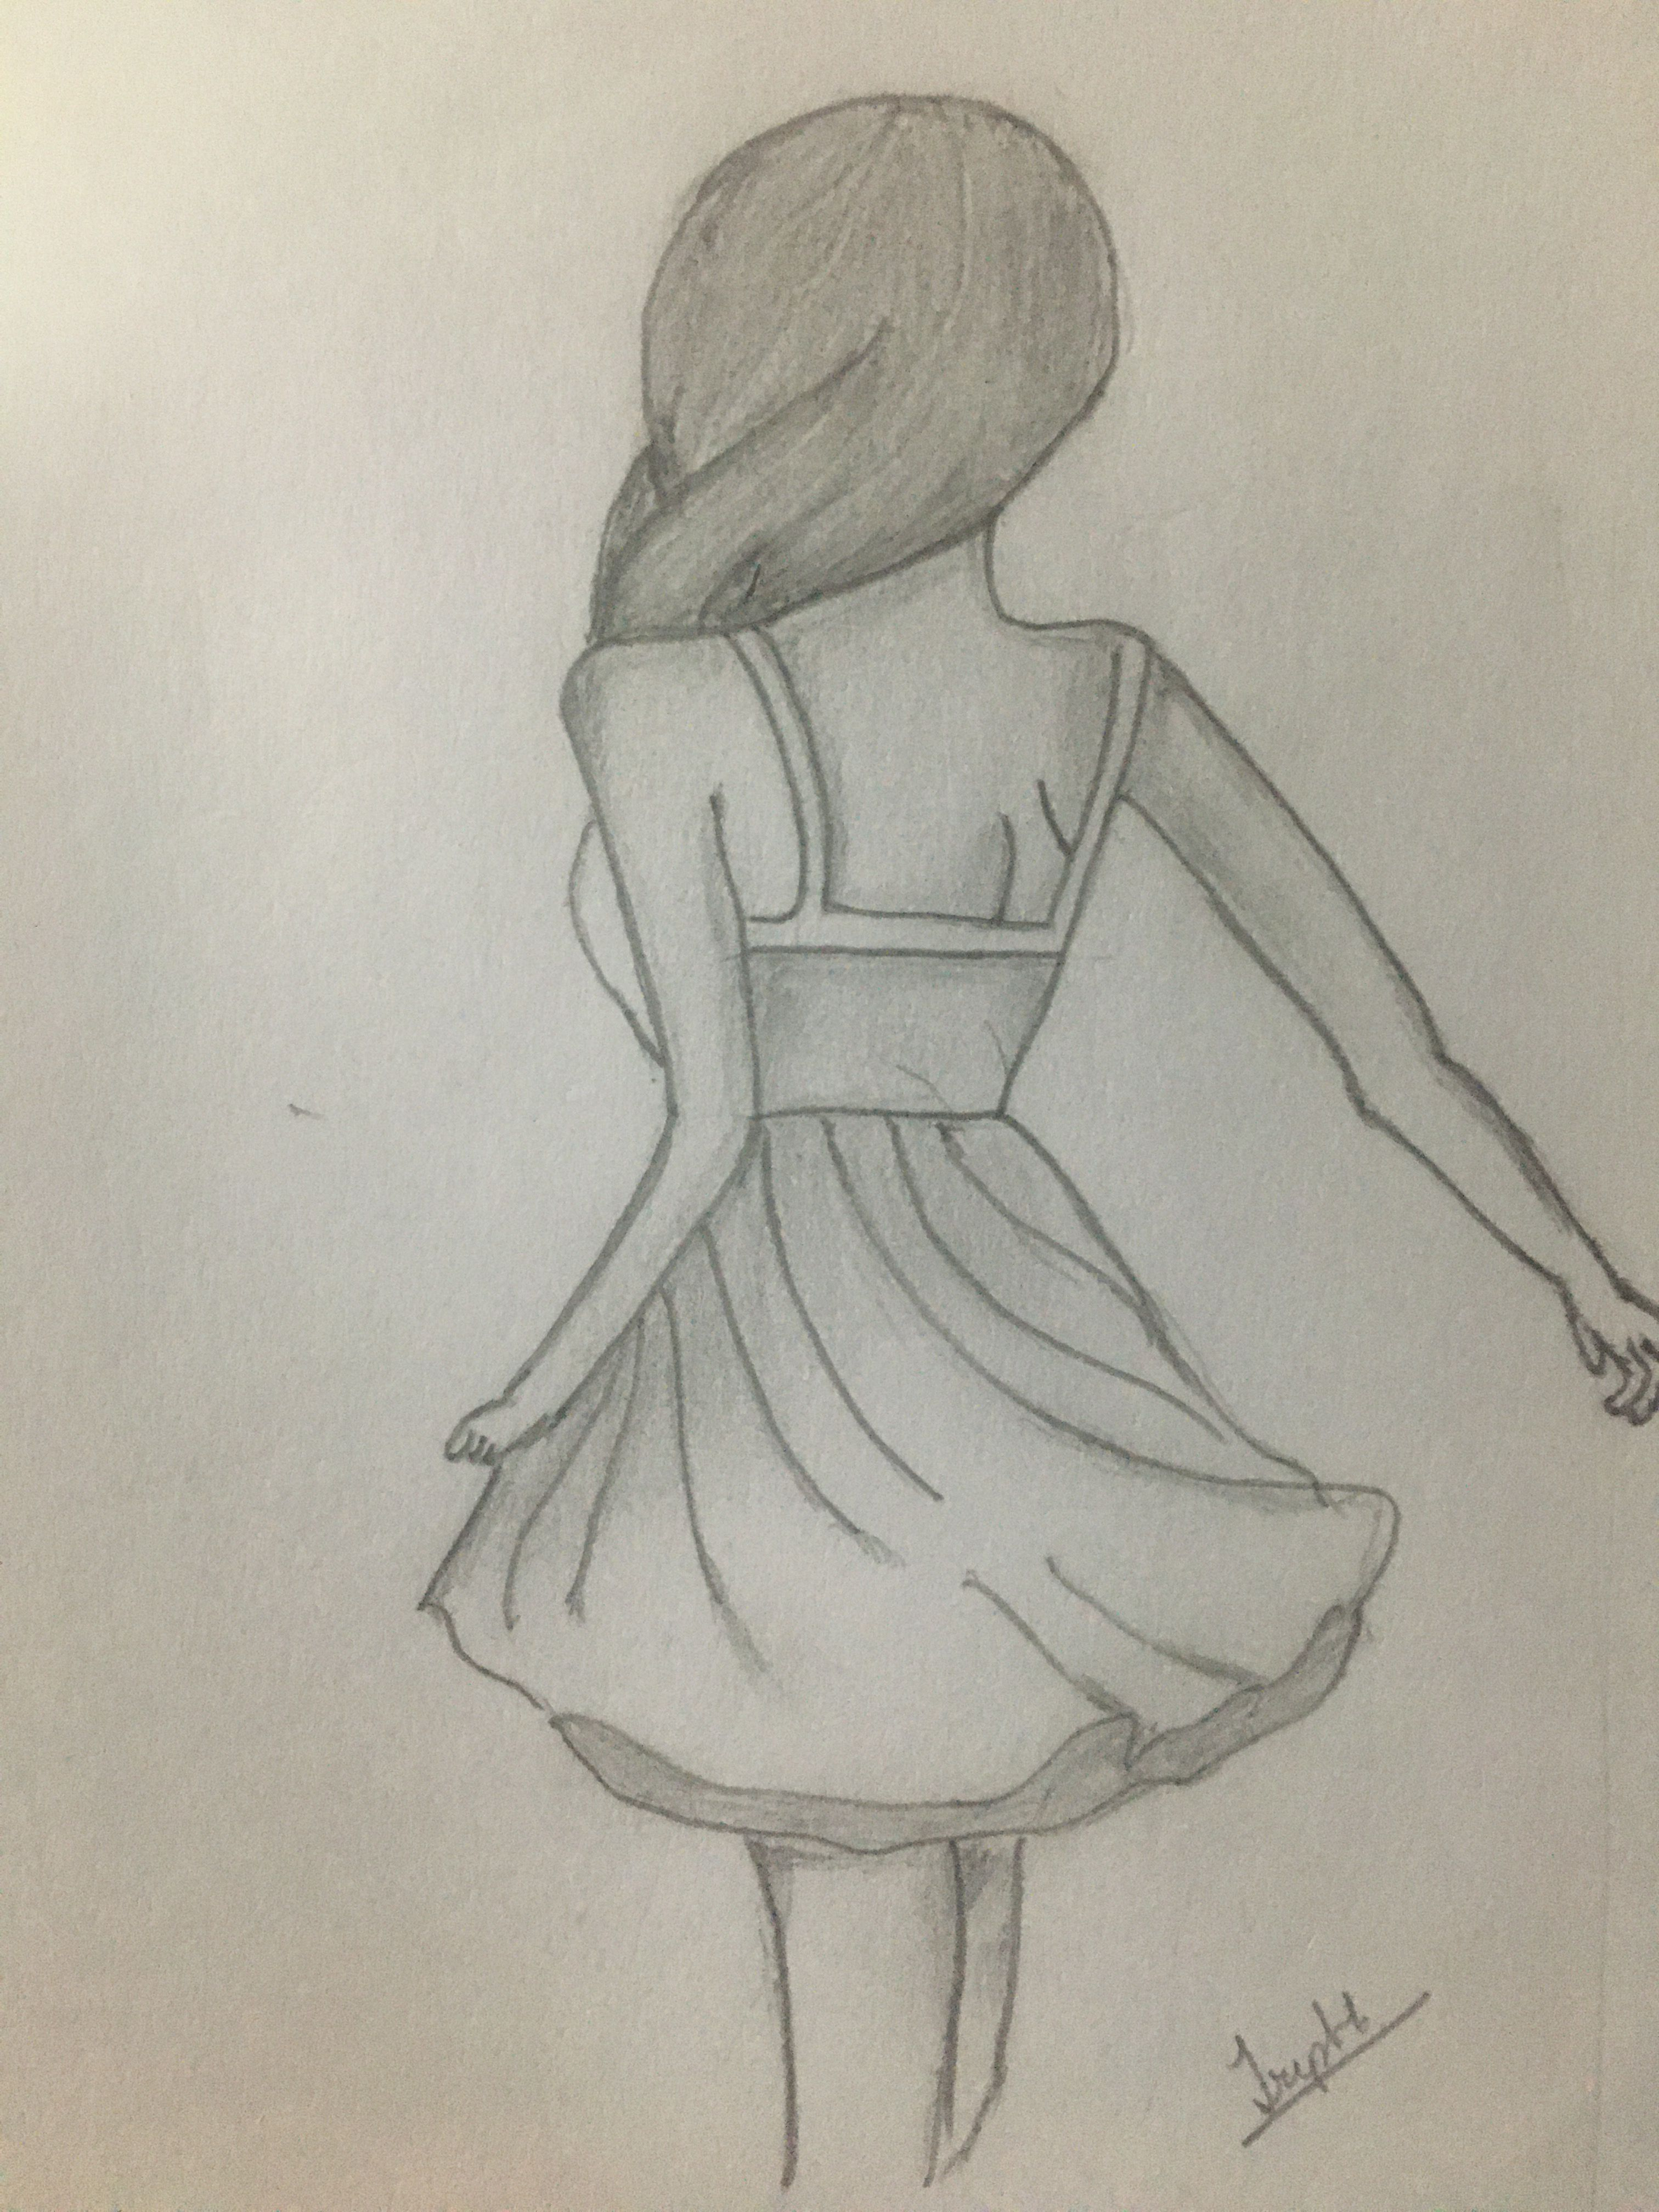 Step by step drawing   Çizim eğitimleri, Karakalem çizimler, Çizim